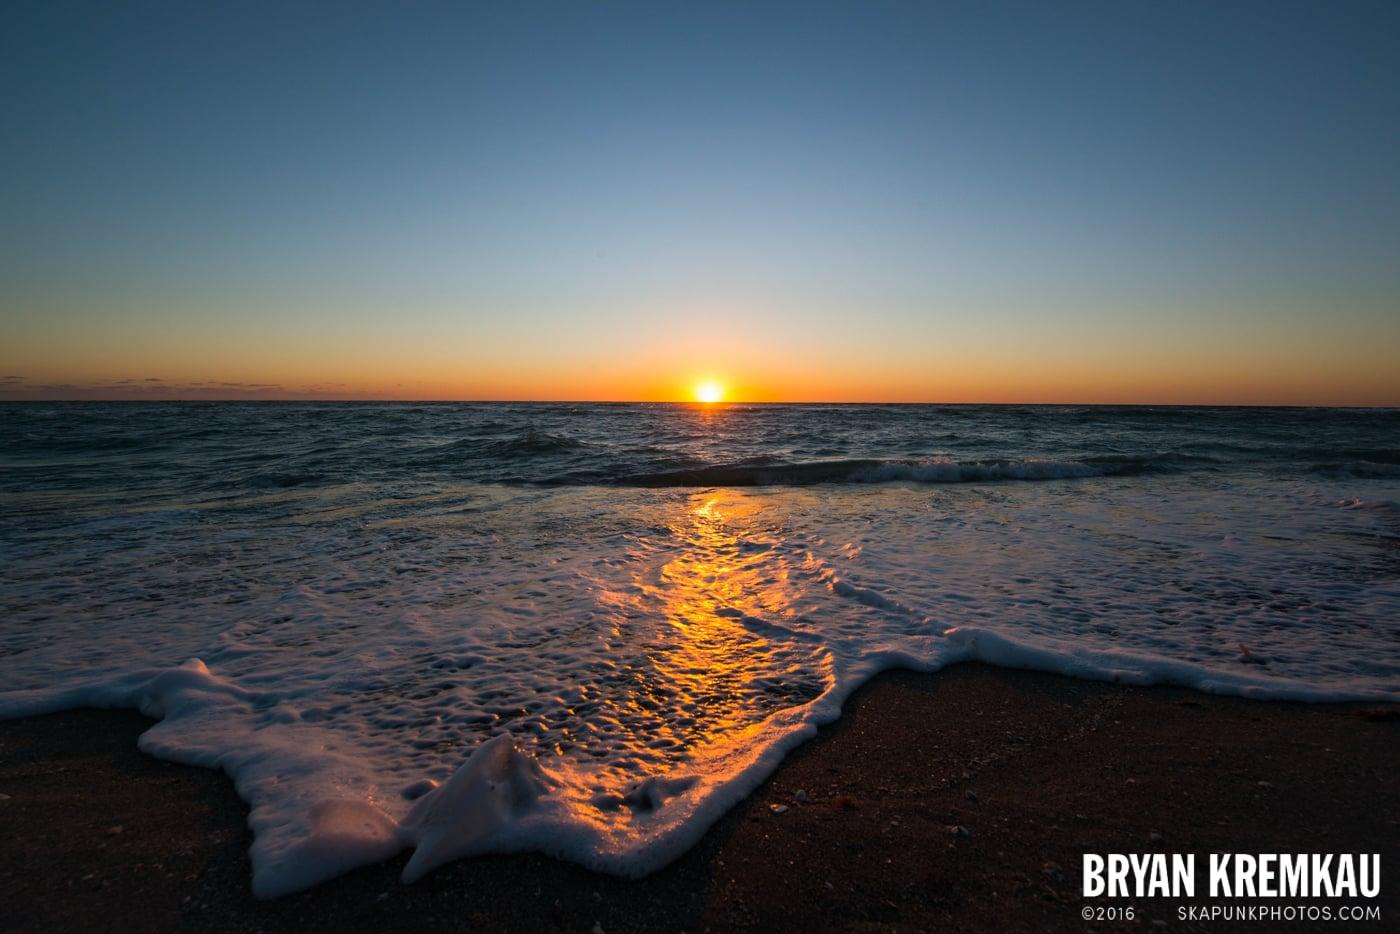 Sunsets, Astrophotography & Birds @ Venice, Florida - 10.25.14 - 11.5.14 (99)